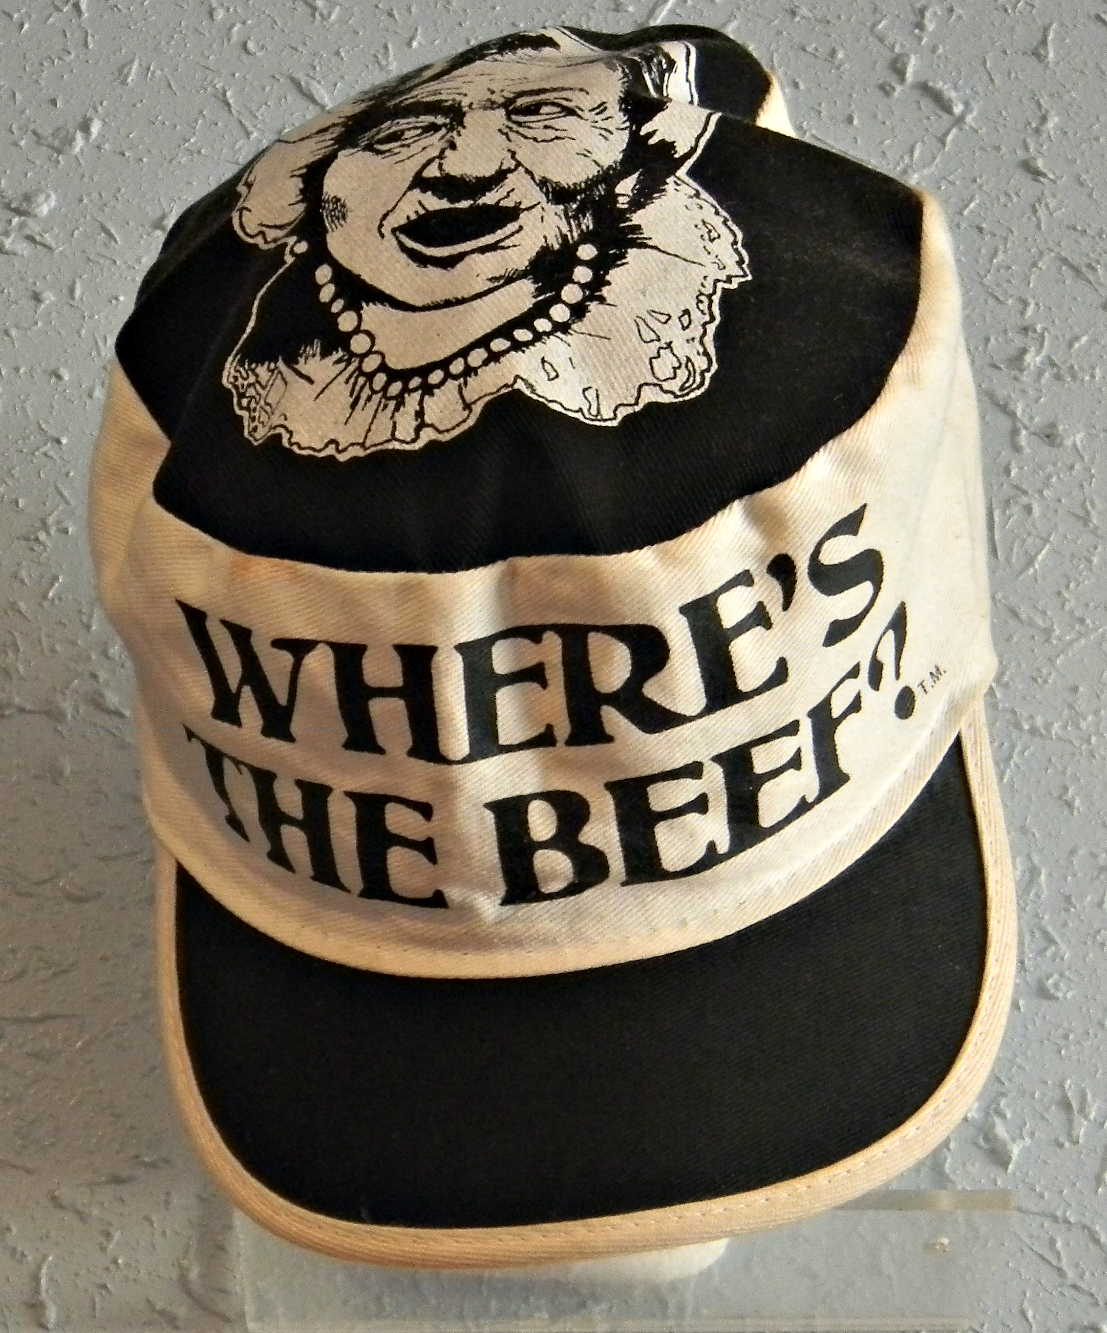 Joe Sedelmaier 'Where's The Beef' 2